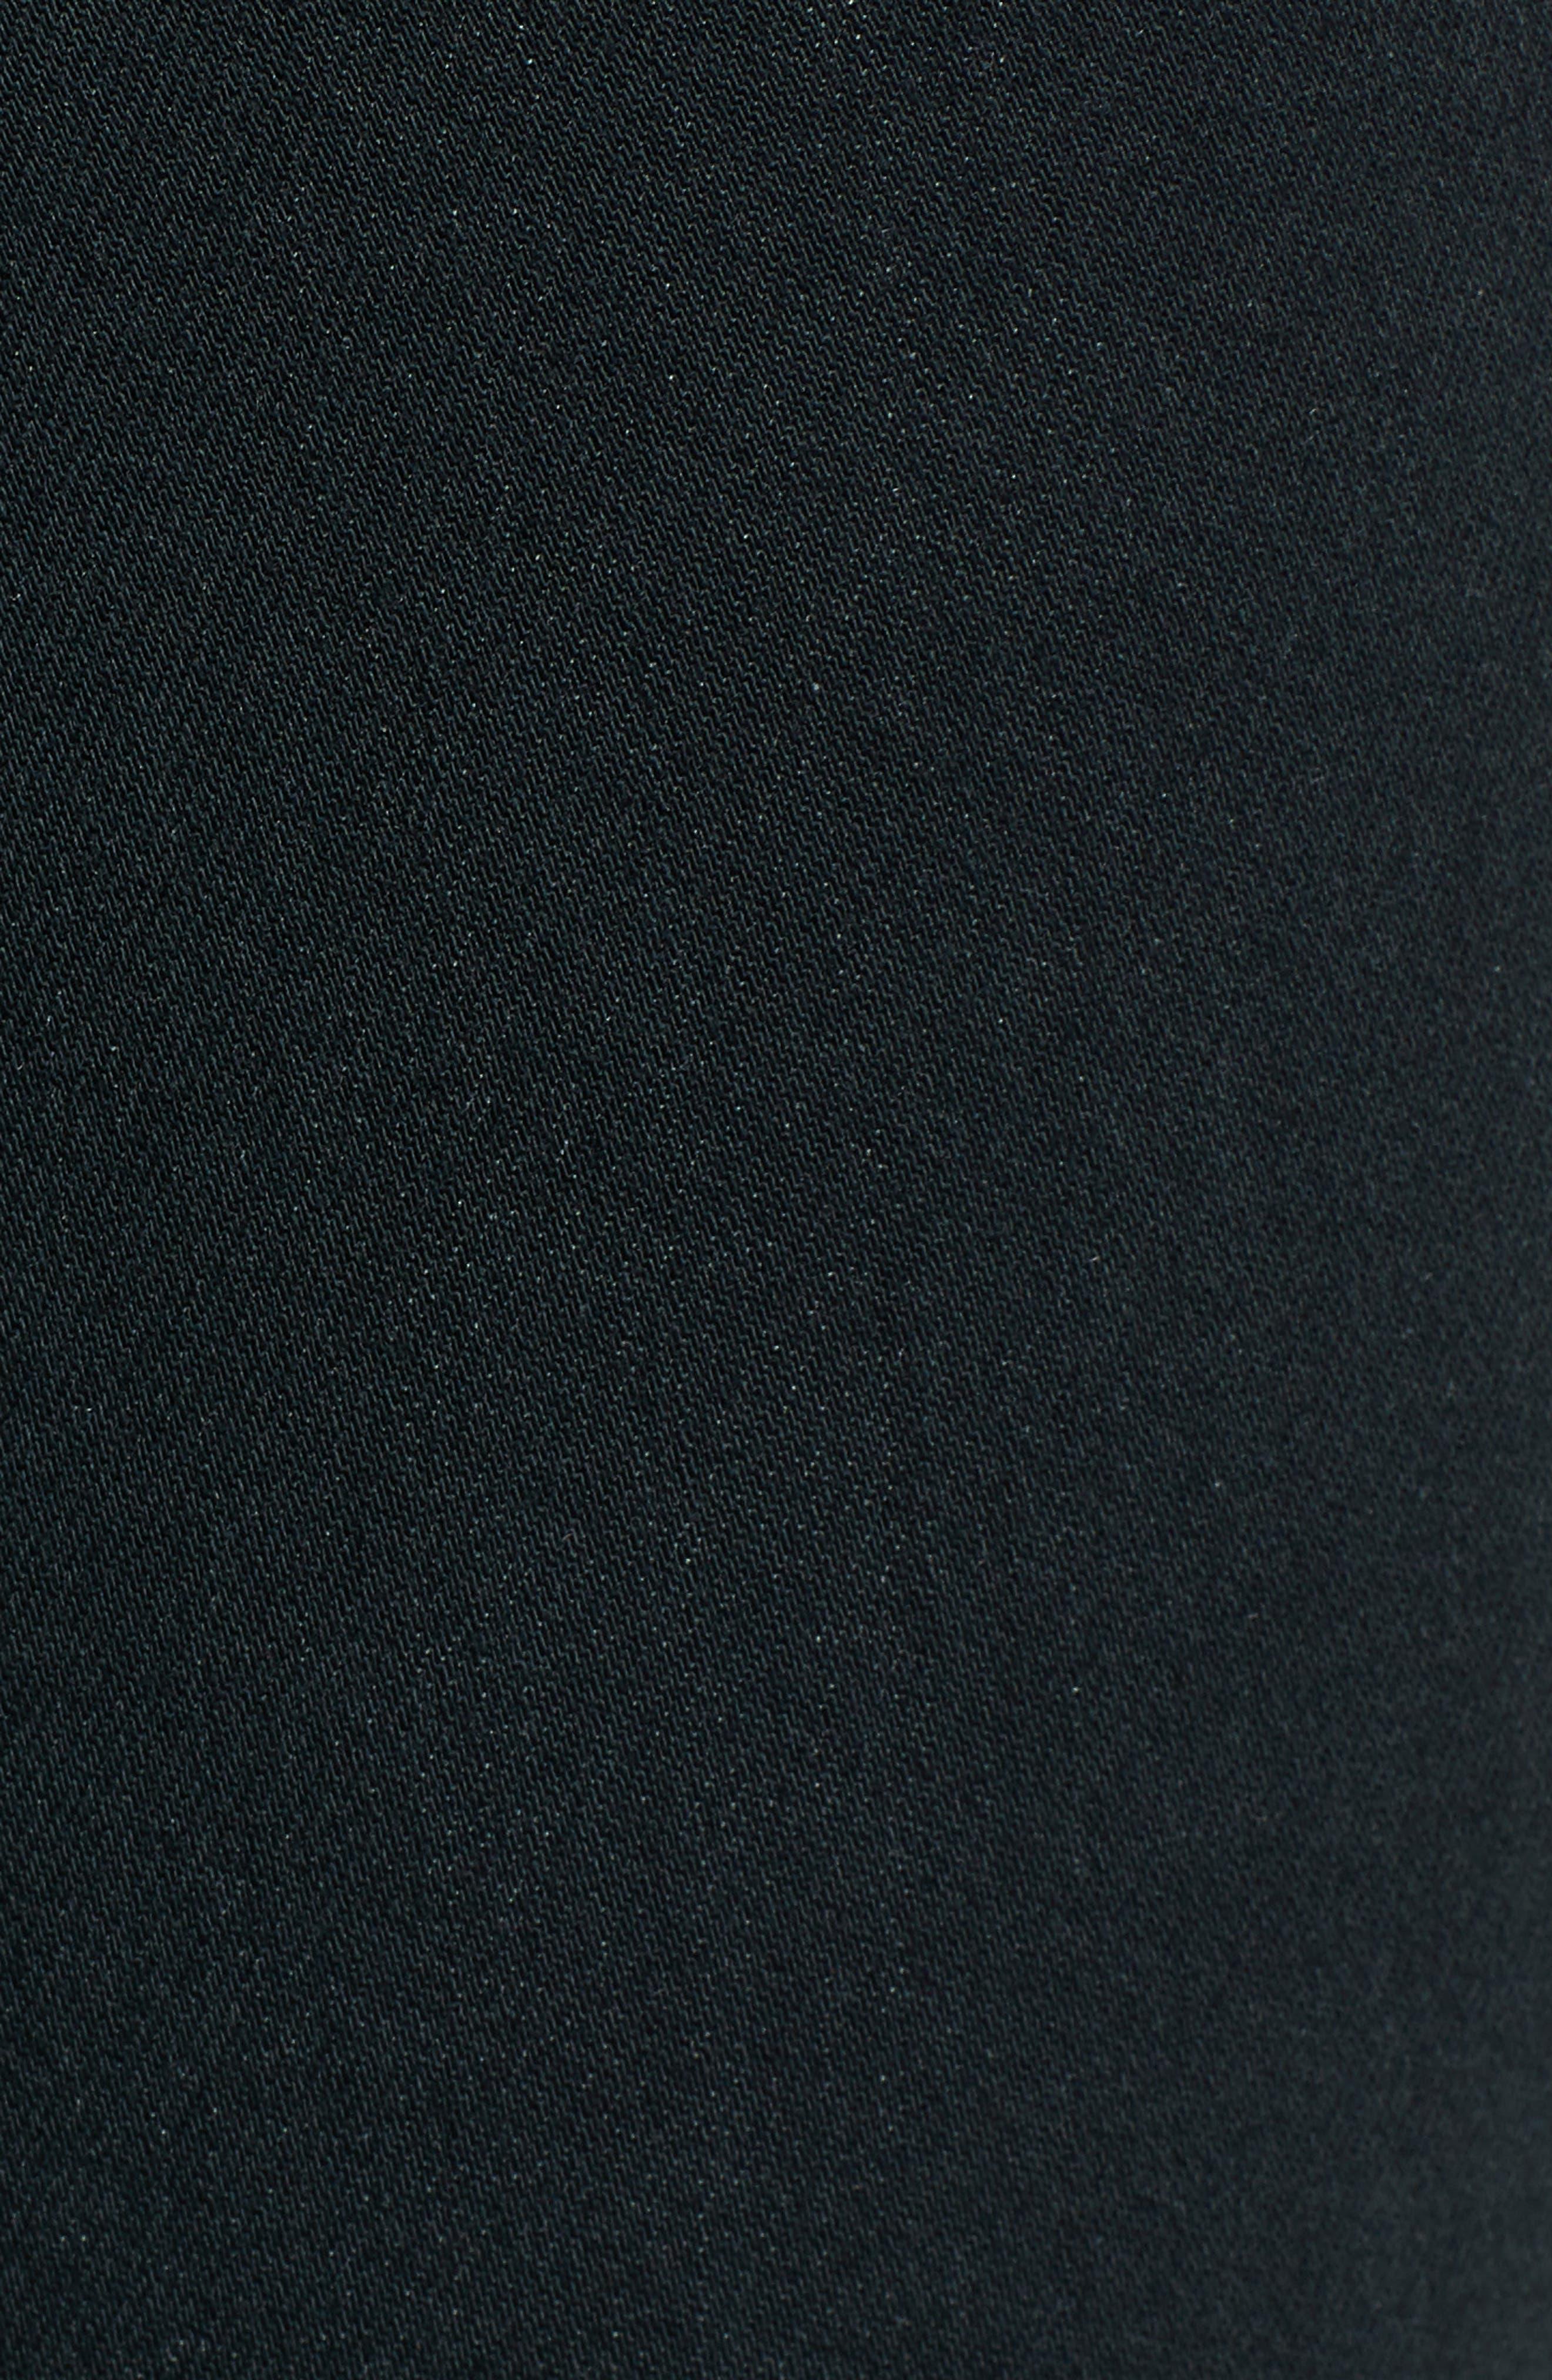 Transcend - Verdugo Ultra Skinny Jeans,                             Alternate thumbnail 6, color,                             MIDNIGHT GREEN